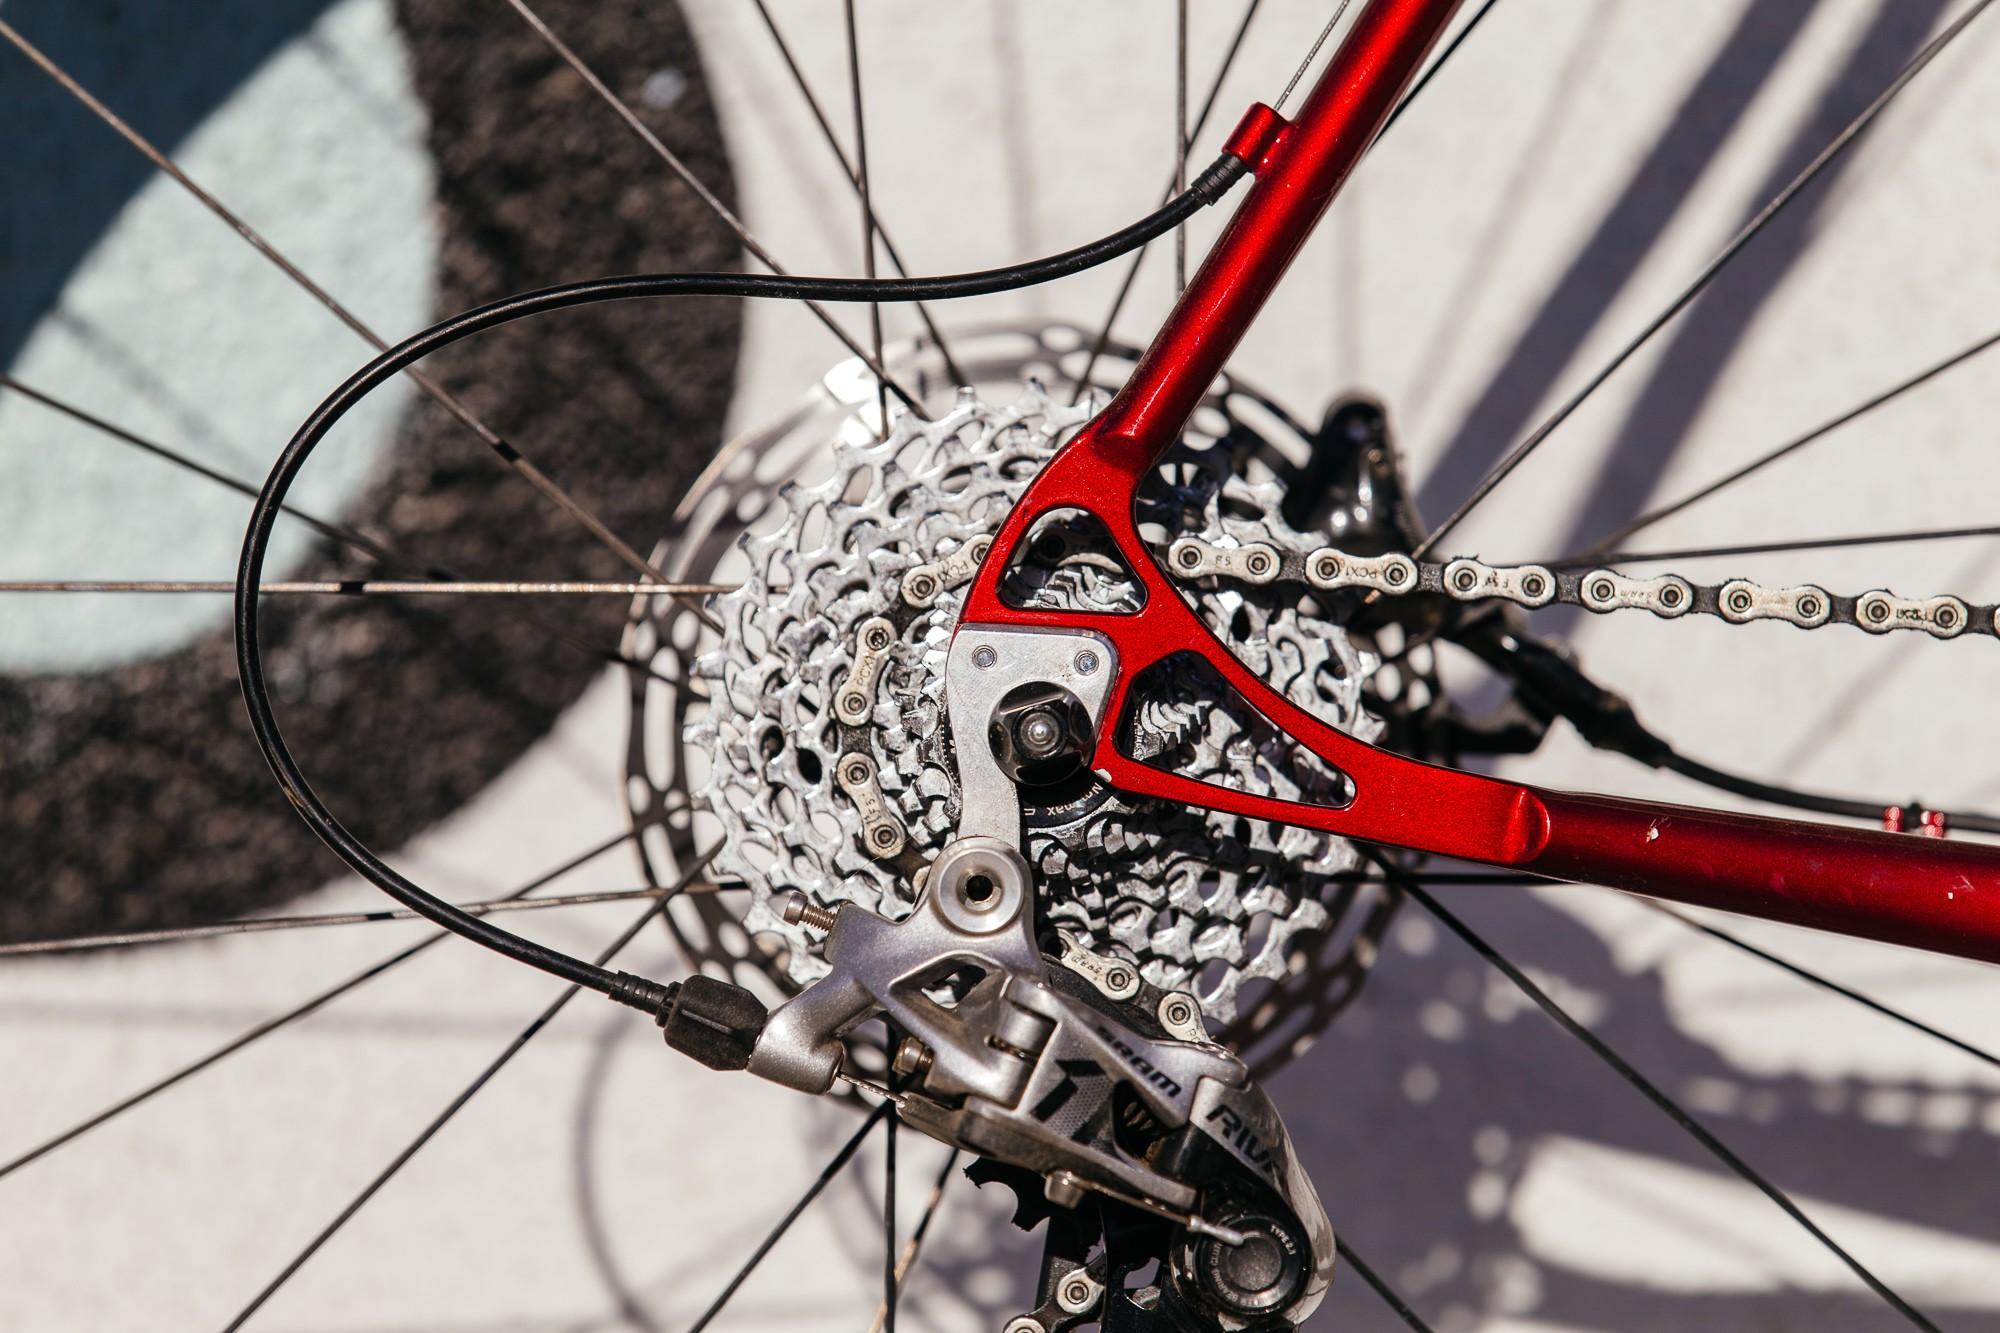 Ericas-Moth-Attack-CX-Team-Bike-21-1335x890@2x.jpg